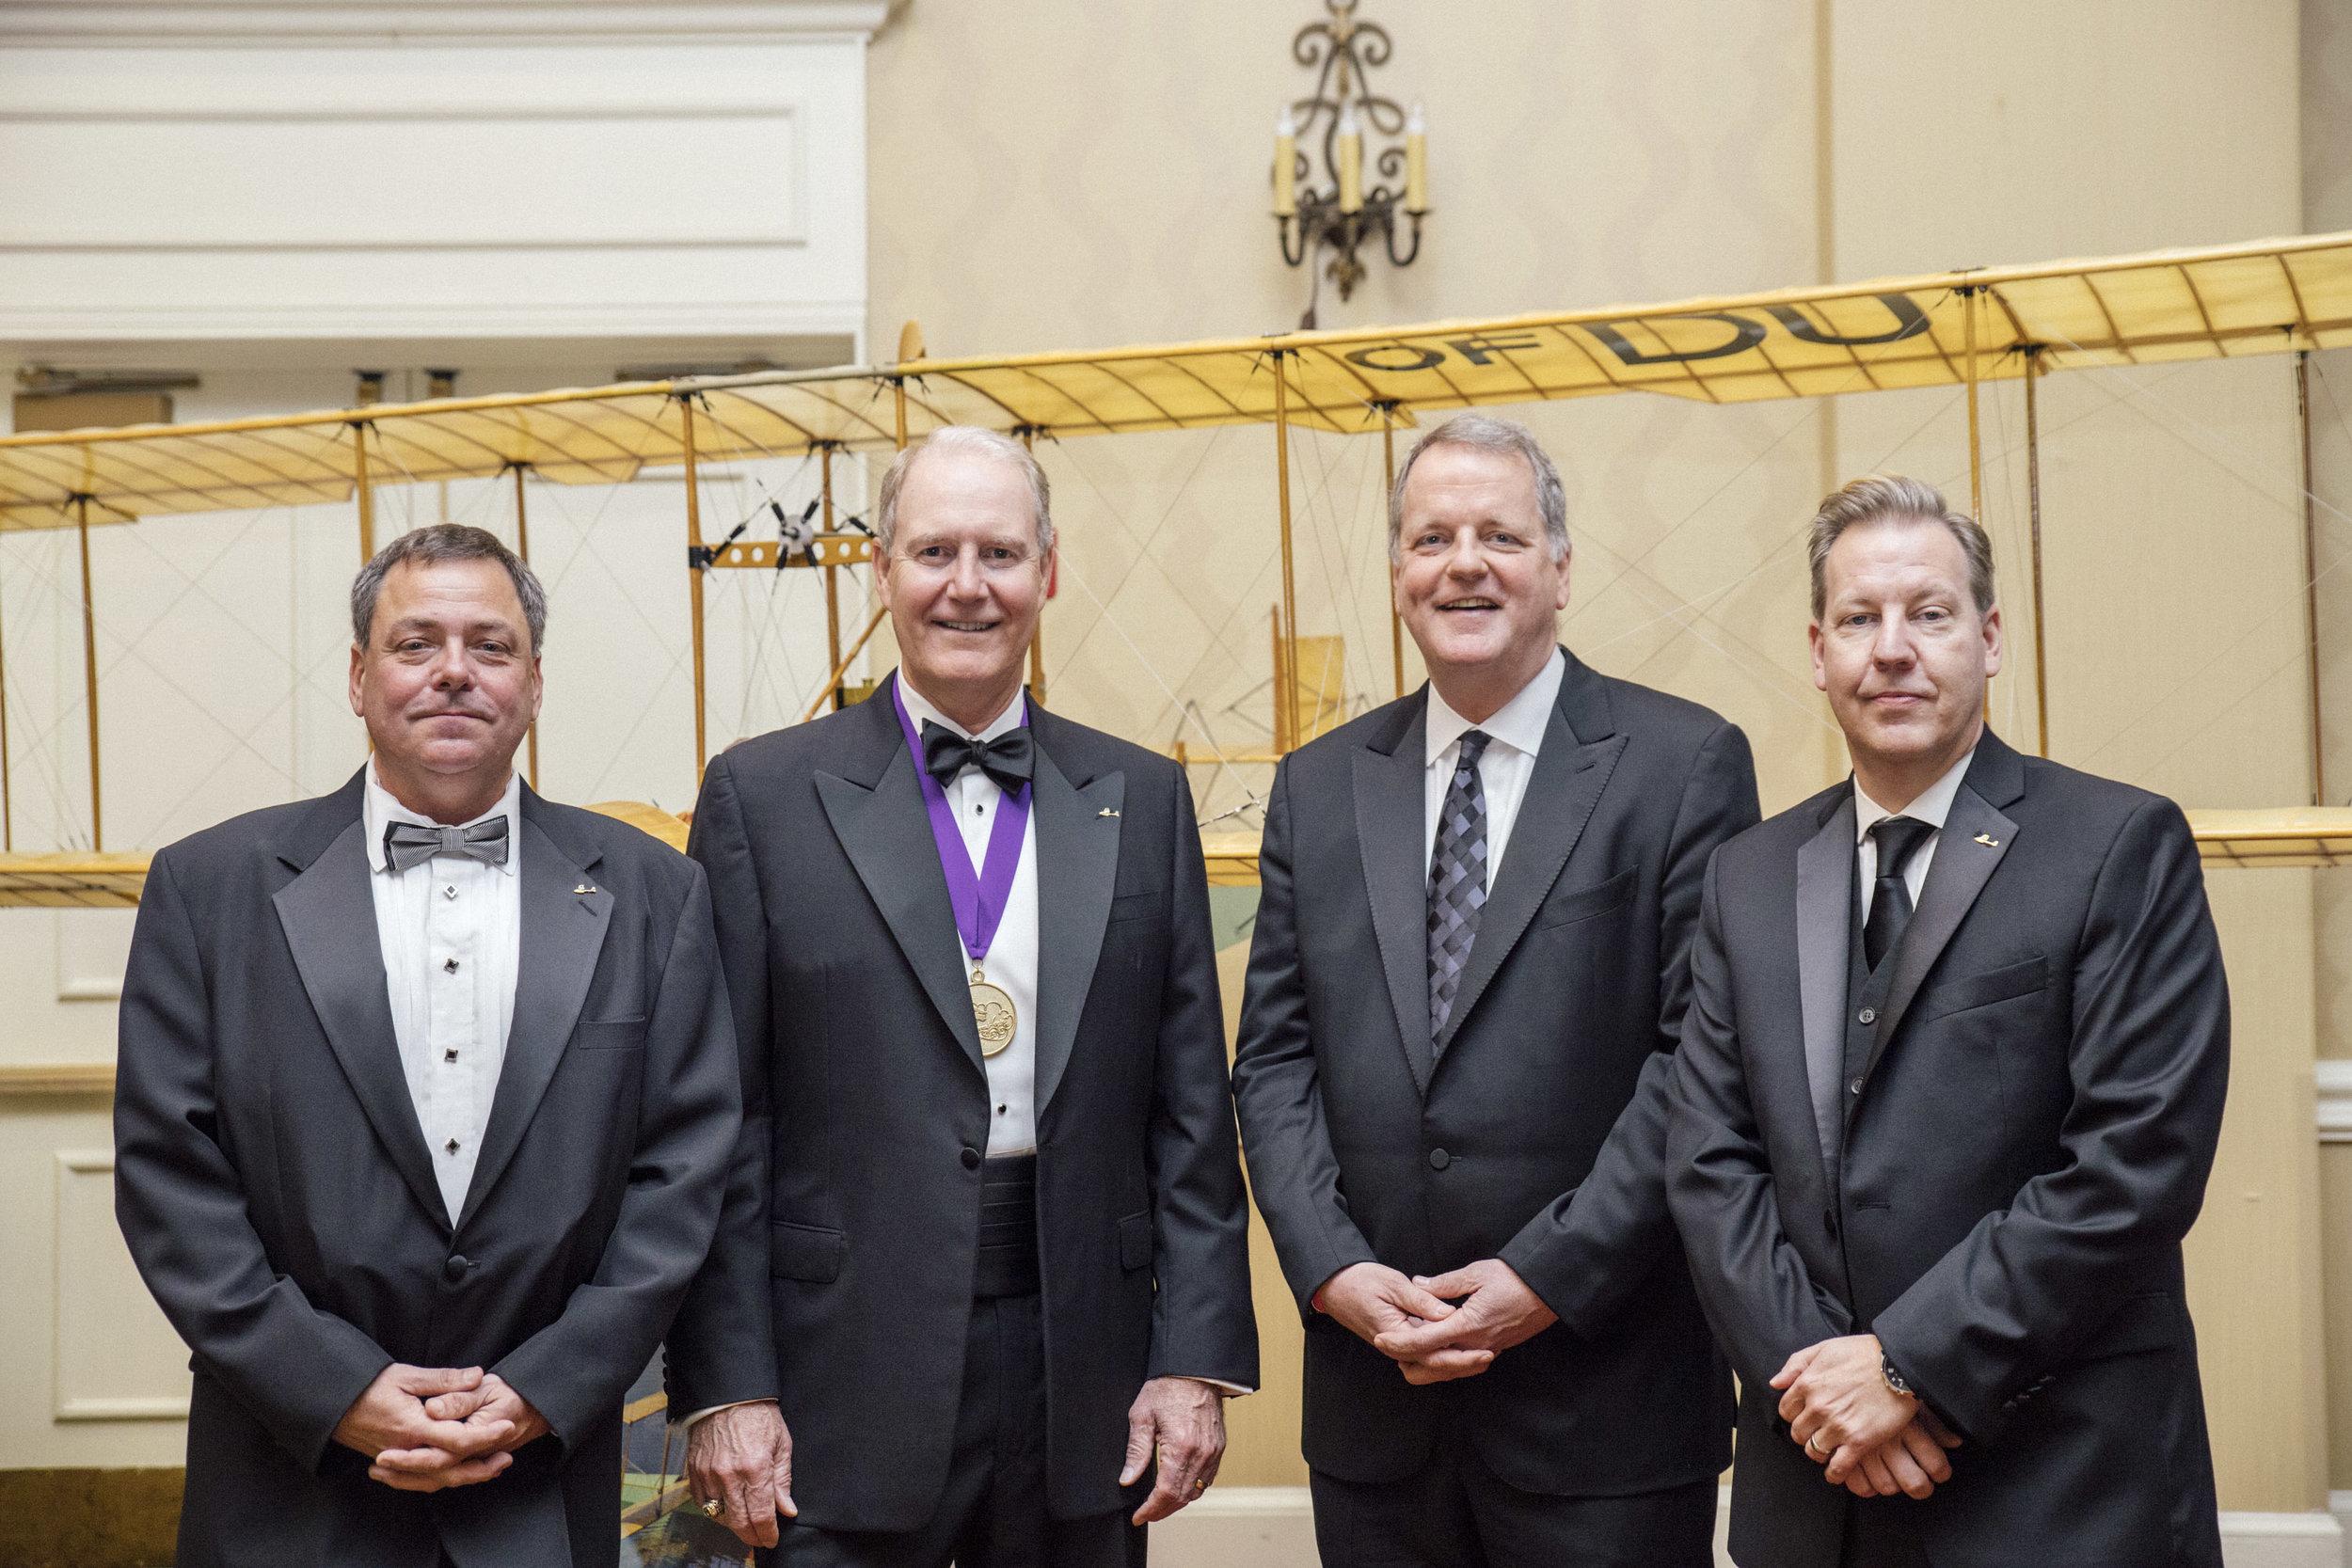 Paul Piro, Gary Kelly, Doug Parker, and Patrick Harrison